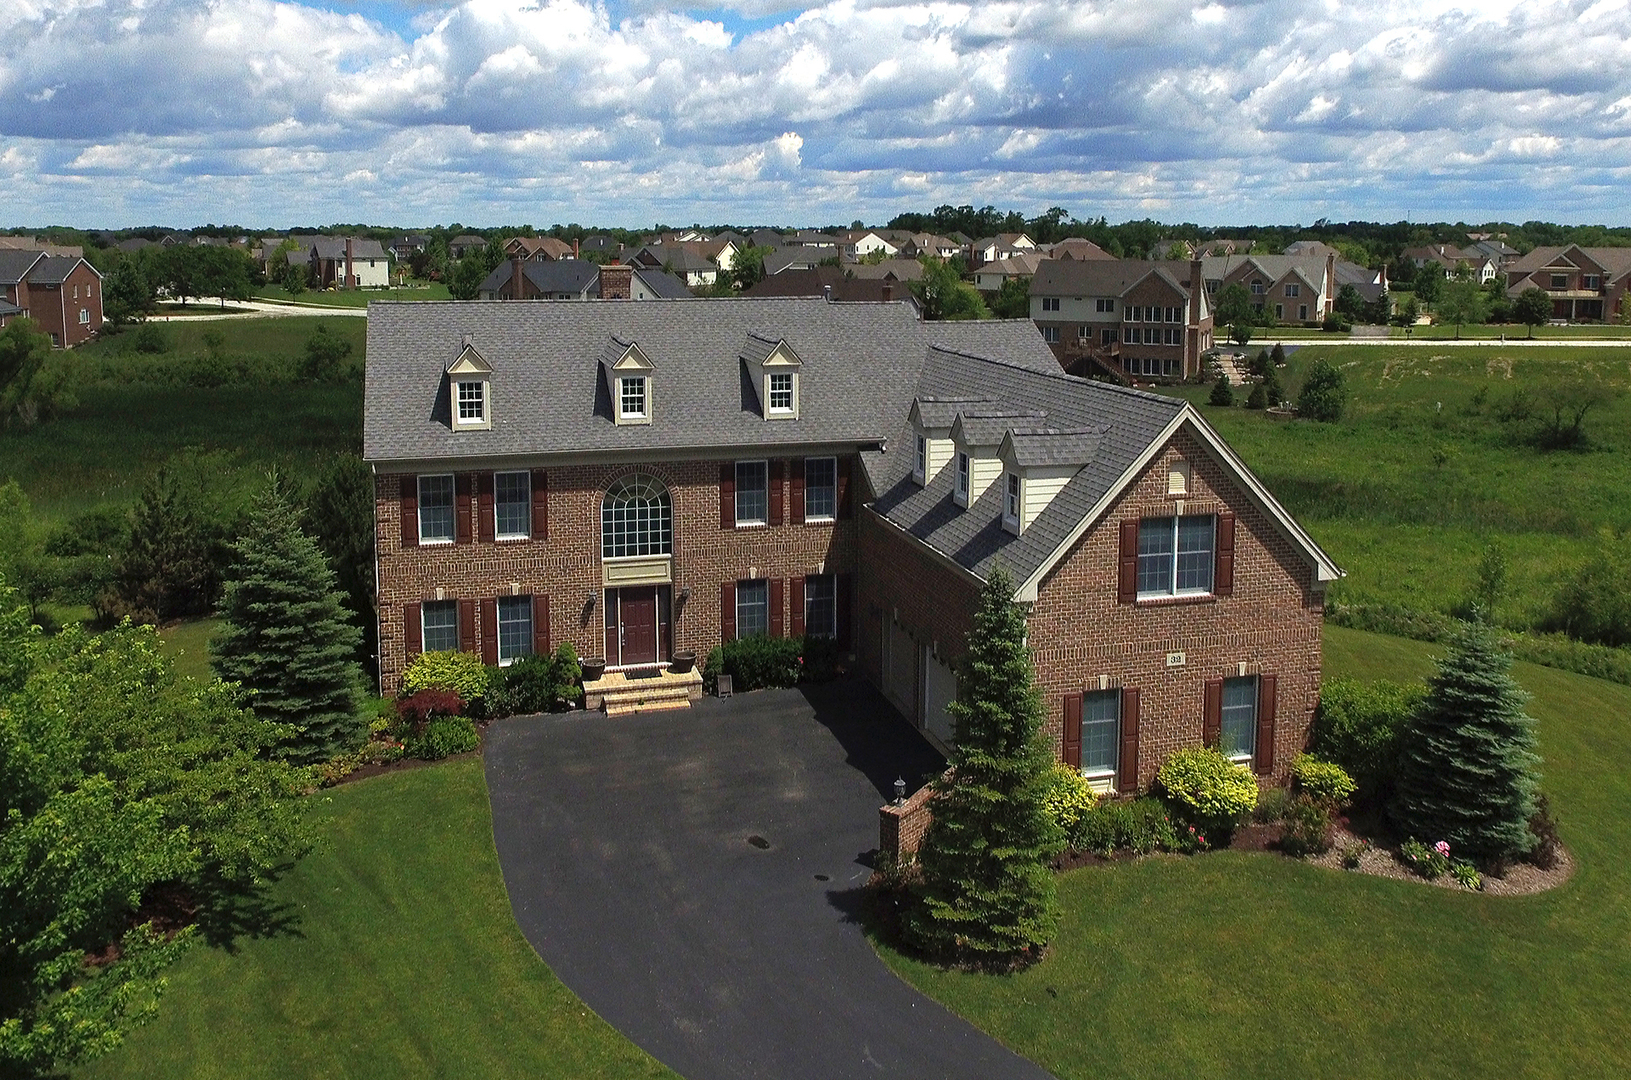 32 Doral Drive, Hawthorn Woods, Illinois 60047